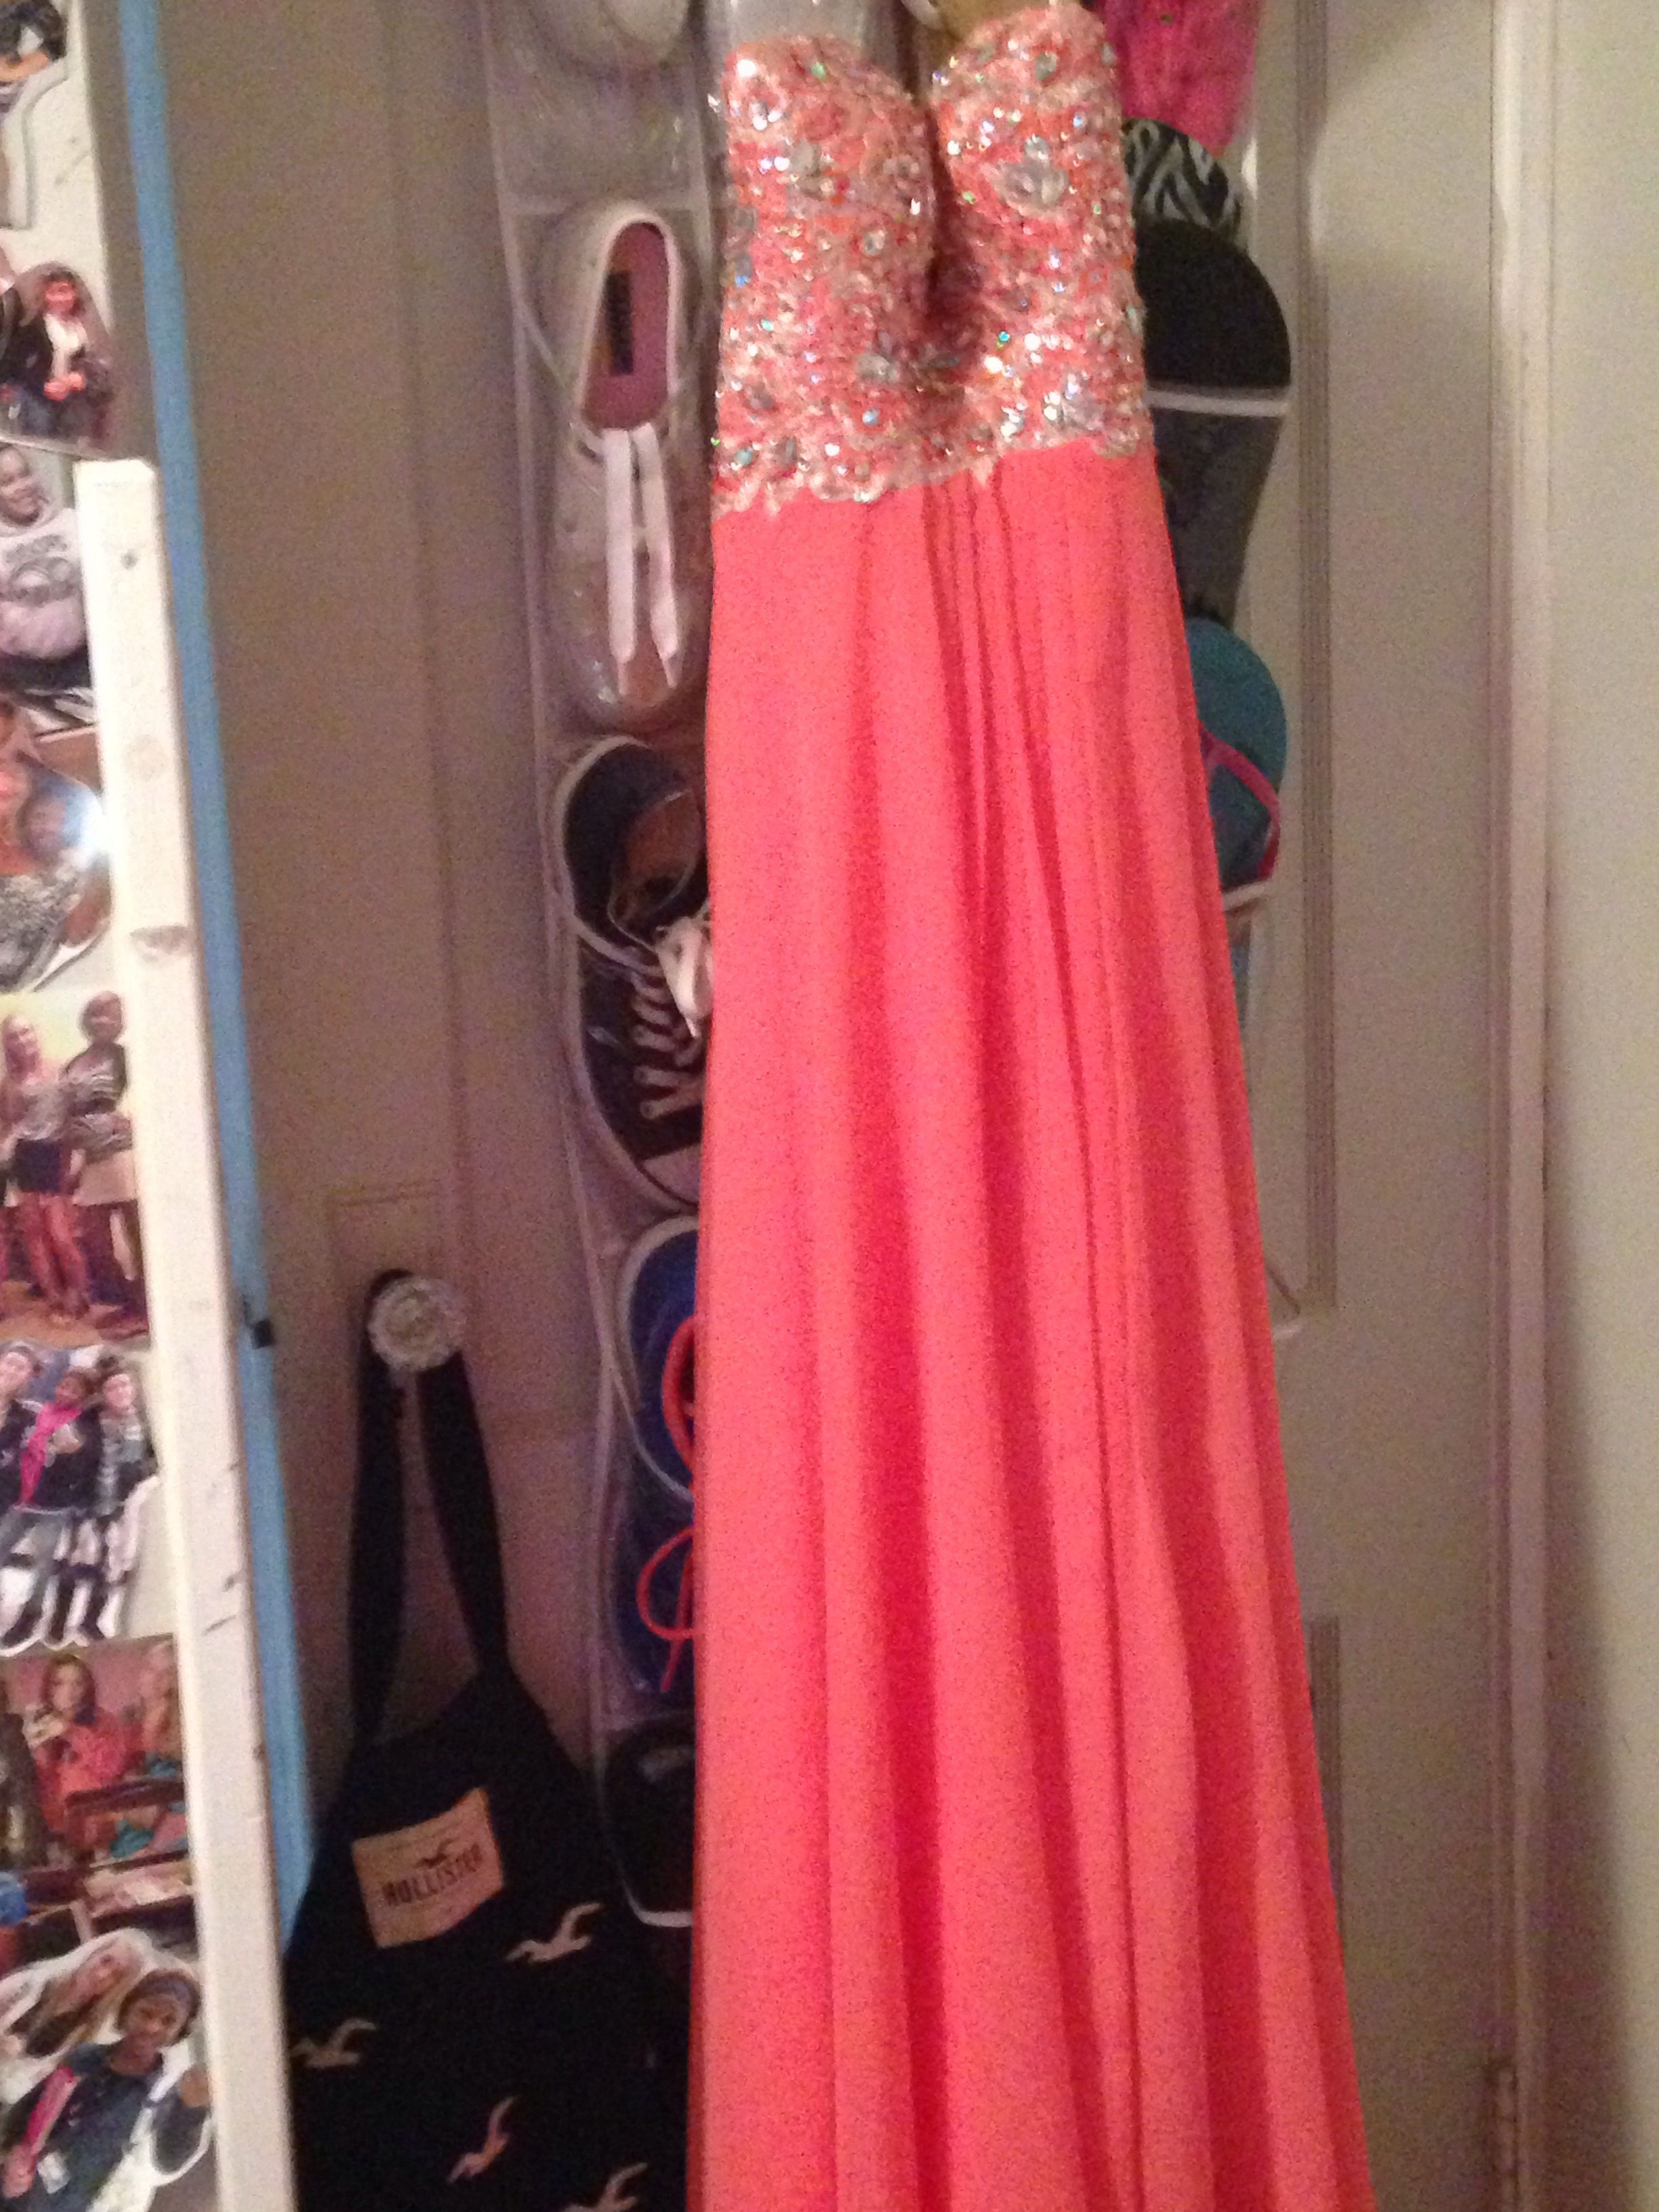 Prom Dress In Ceilg77 S Garage Sale South Bend In Garage Sale